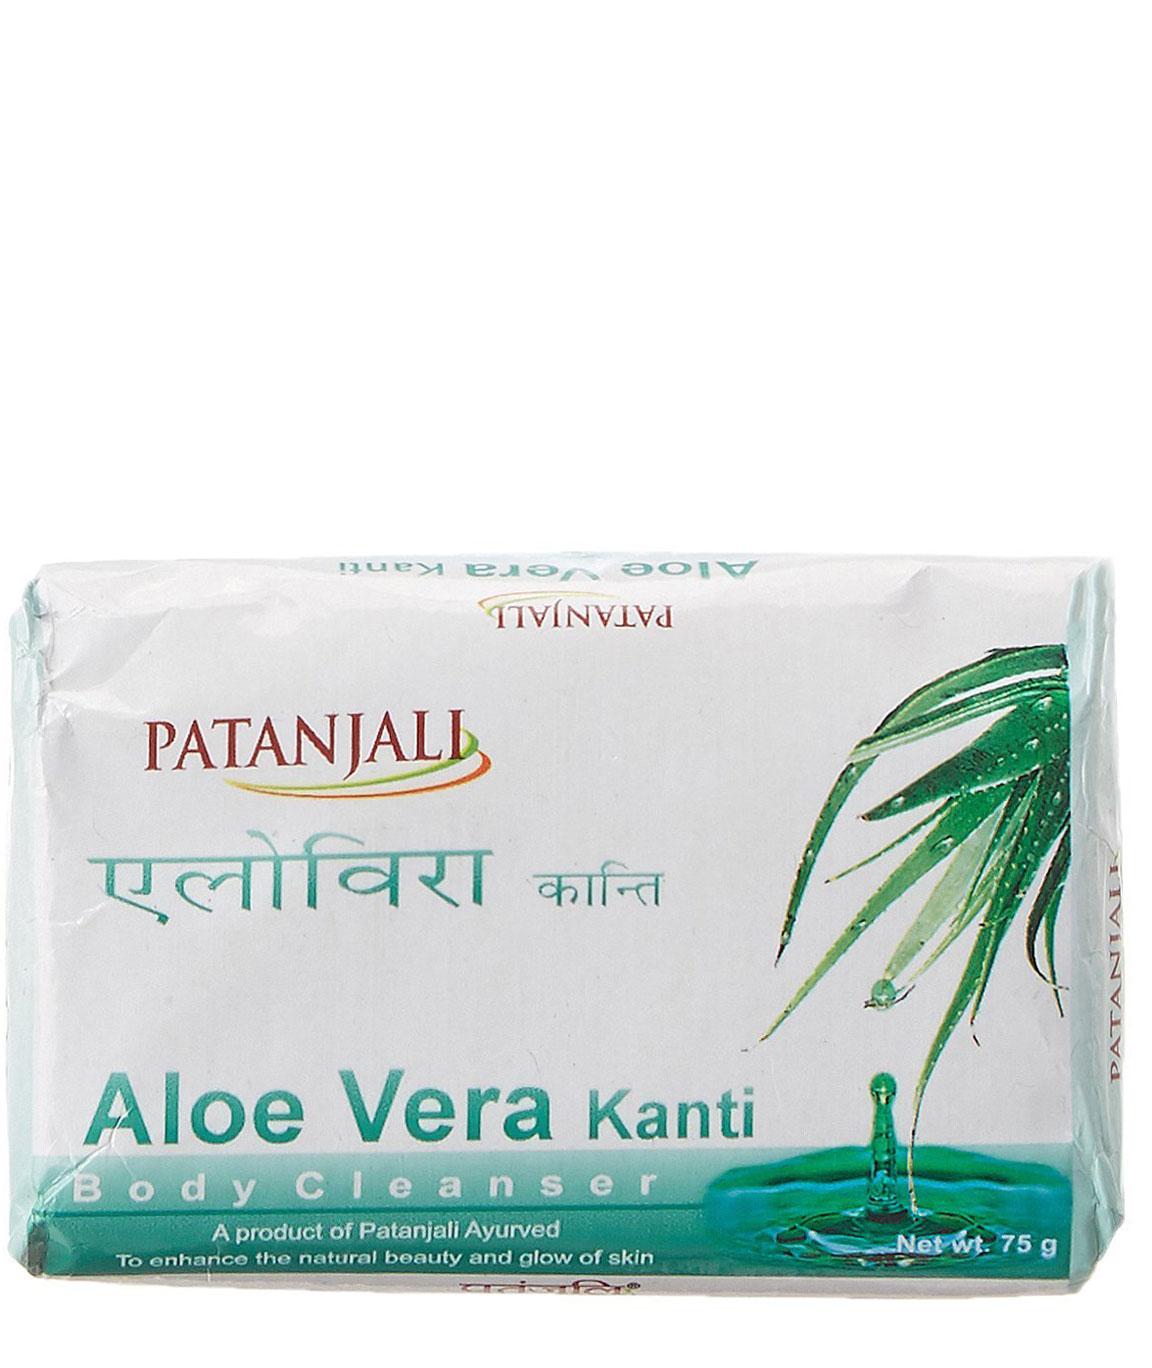 Patanjali Kanti Aloe Vera Body Cleanser Soap, 75g - pack of 2